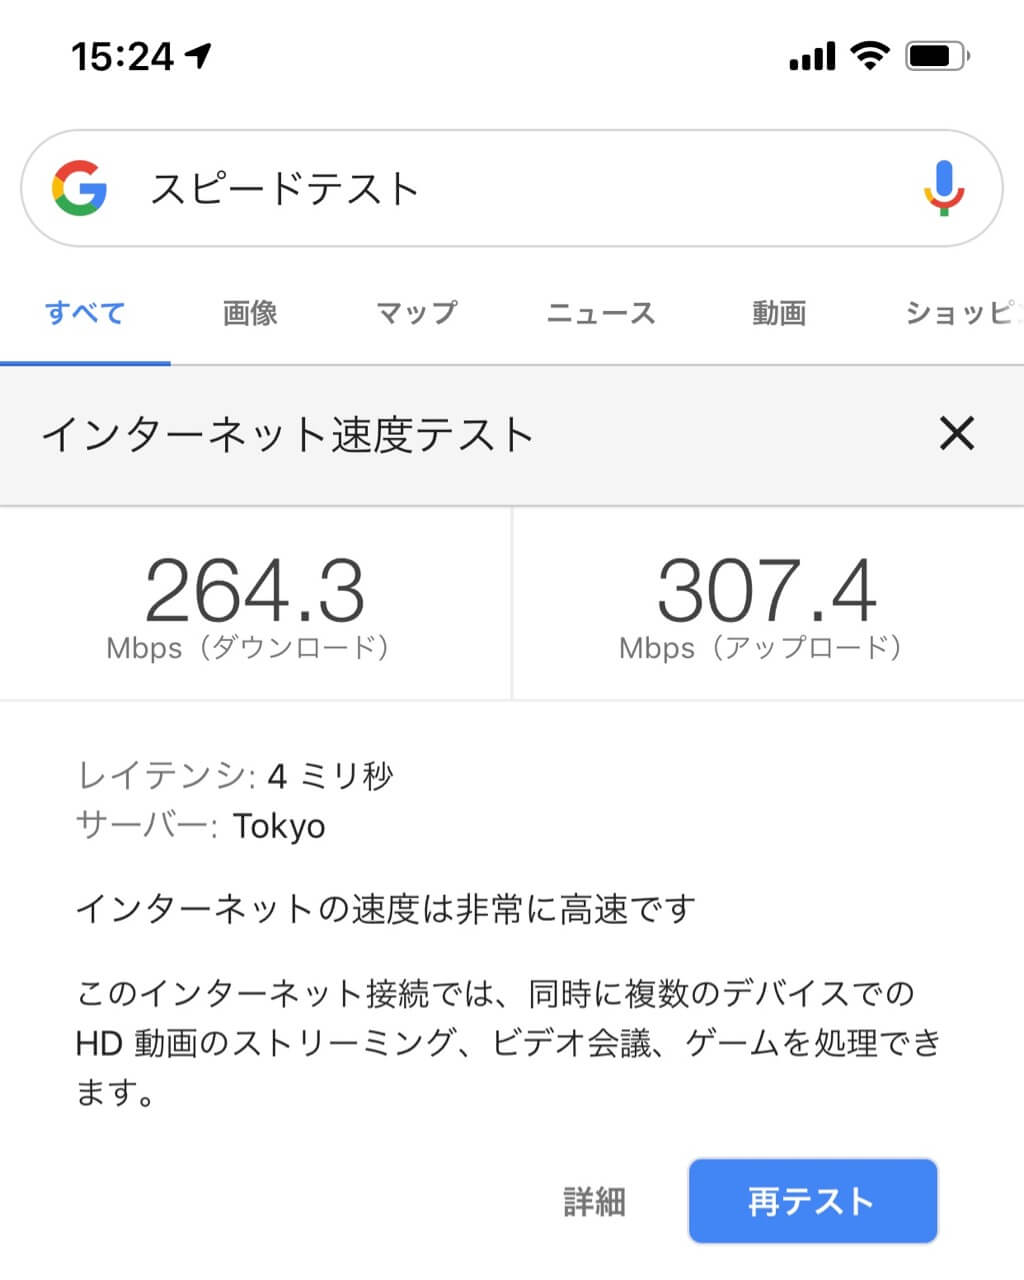 HUAWEI HG8045Q 11acでの速度